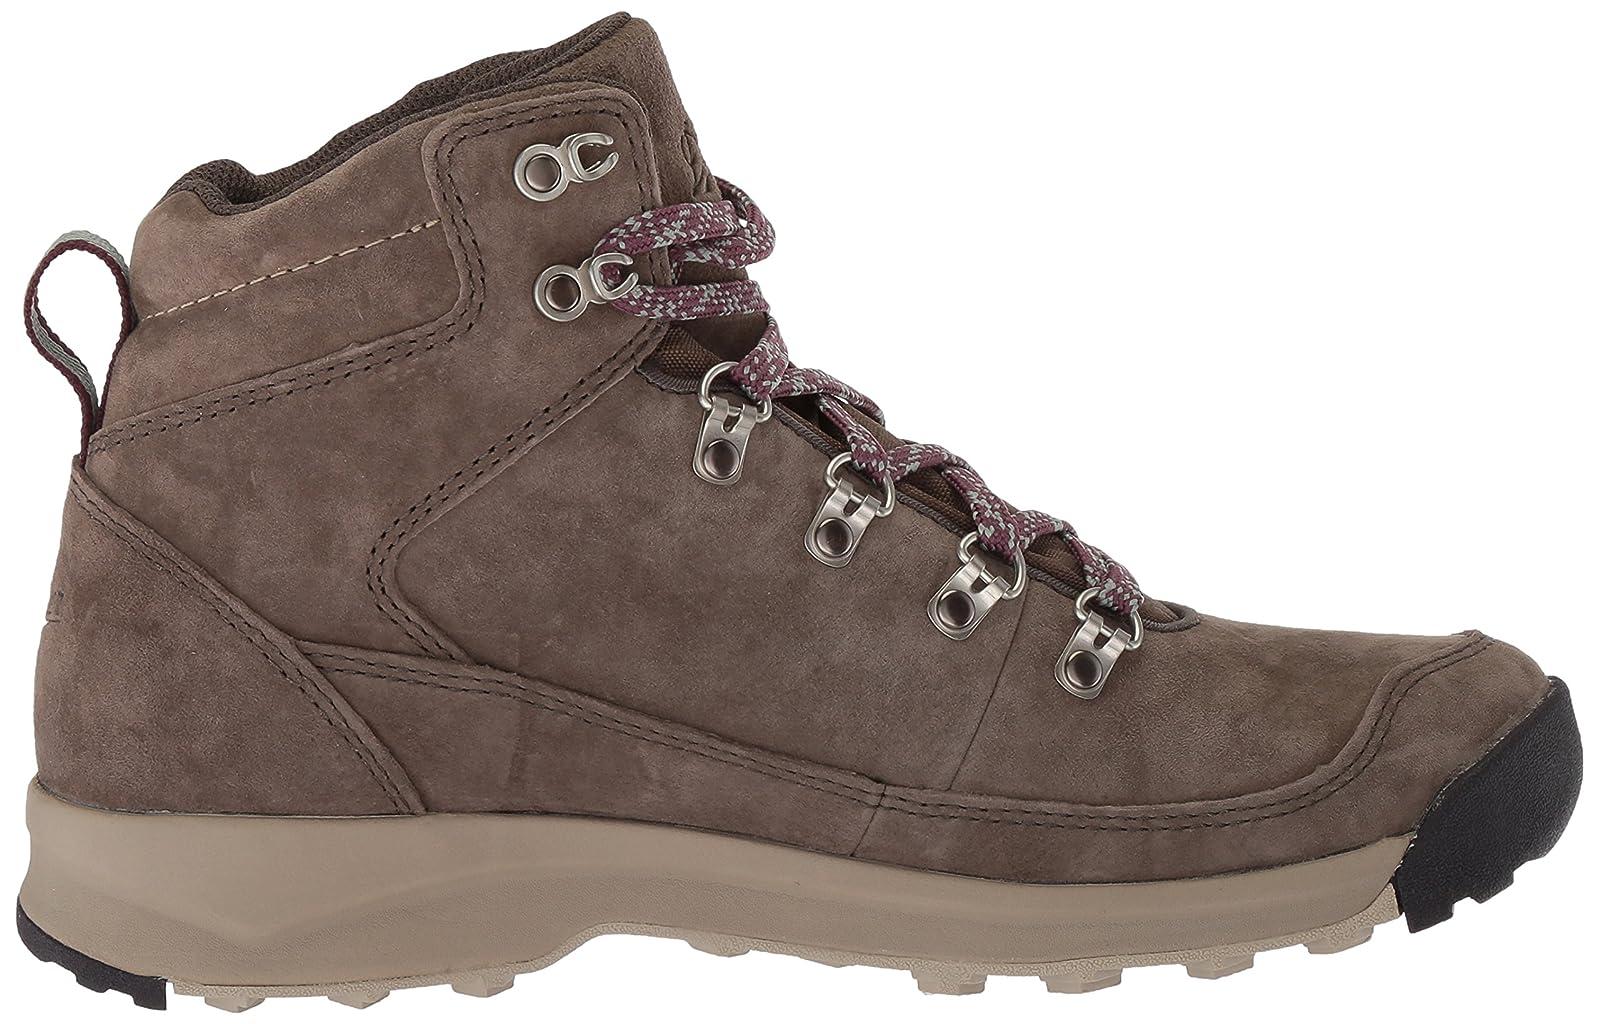 Danner Women's Adrika Hiker Hiking Boot 2 M US Boy - 7